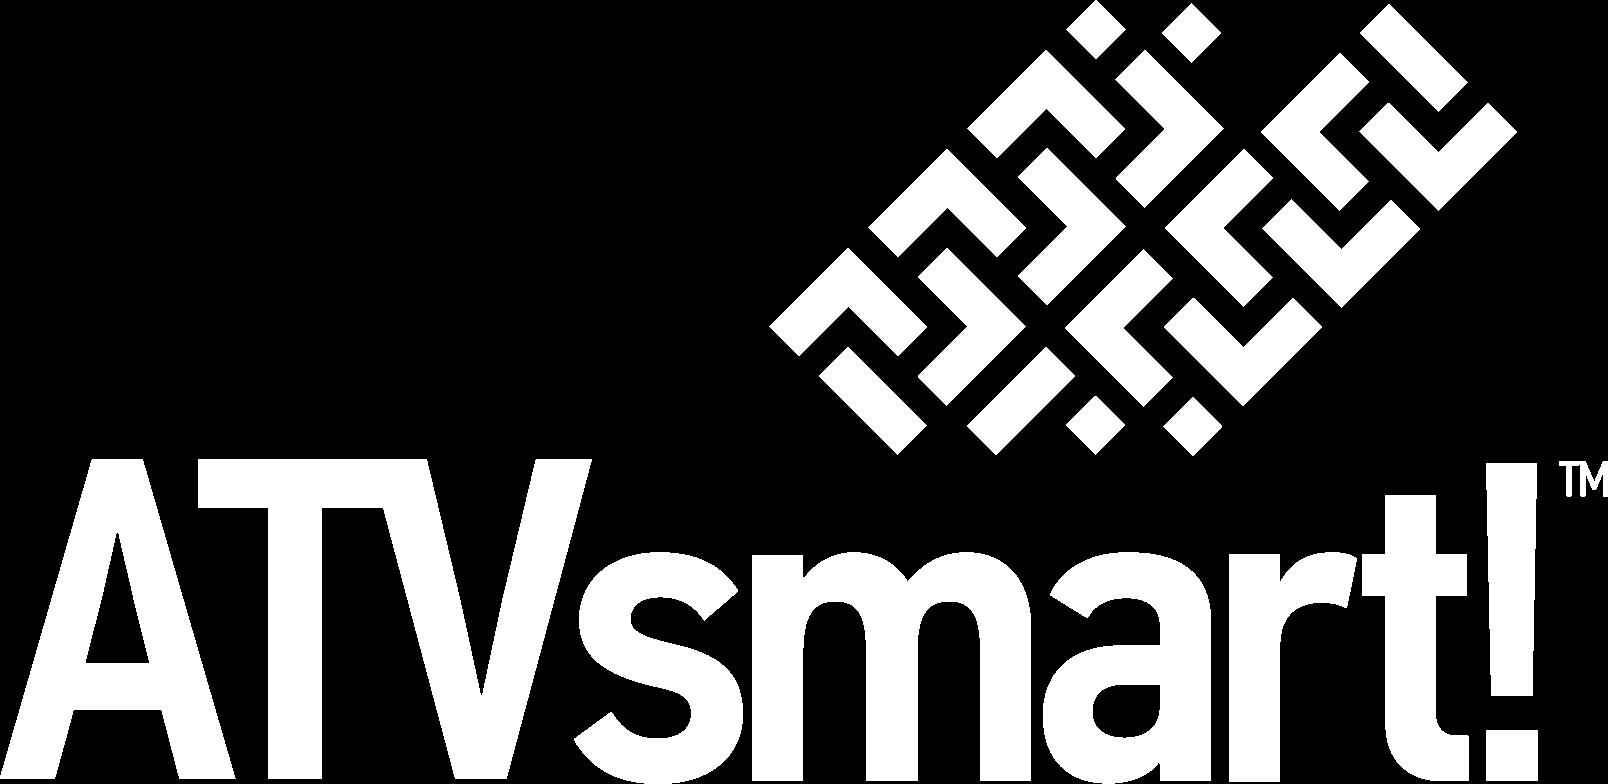 ATVsmart! logo.